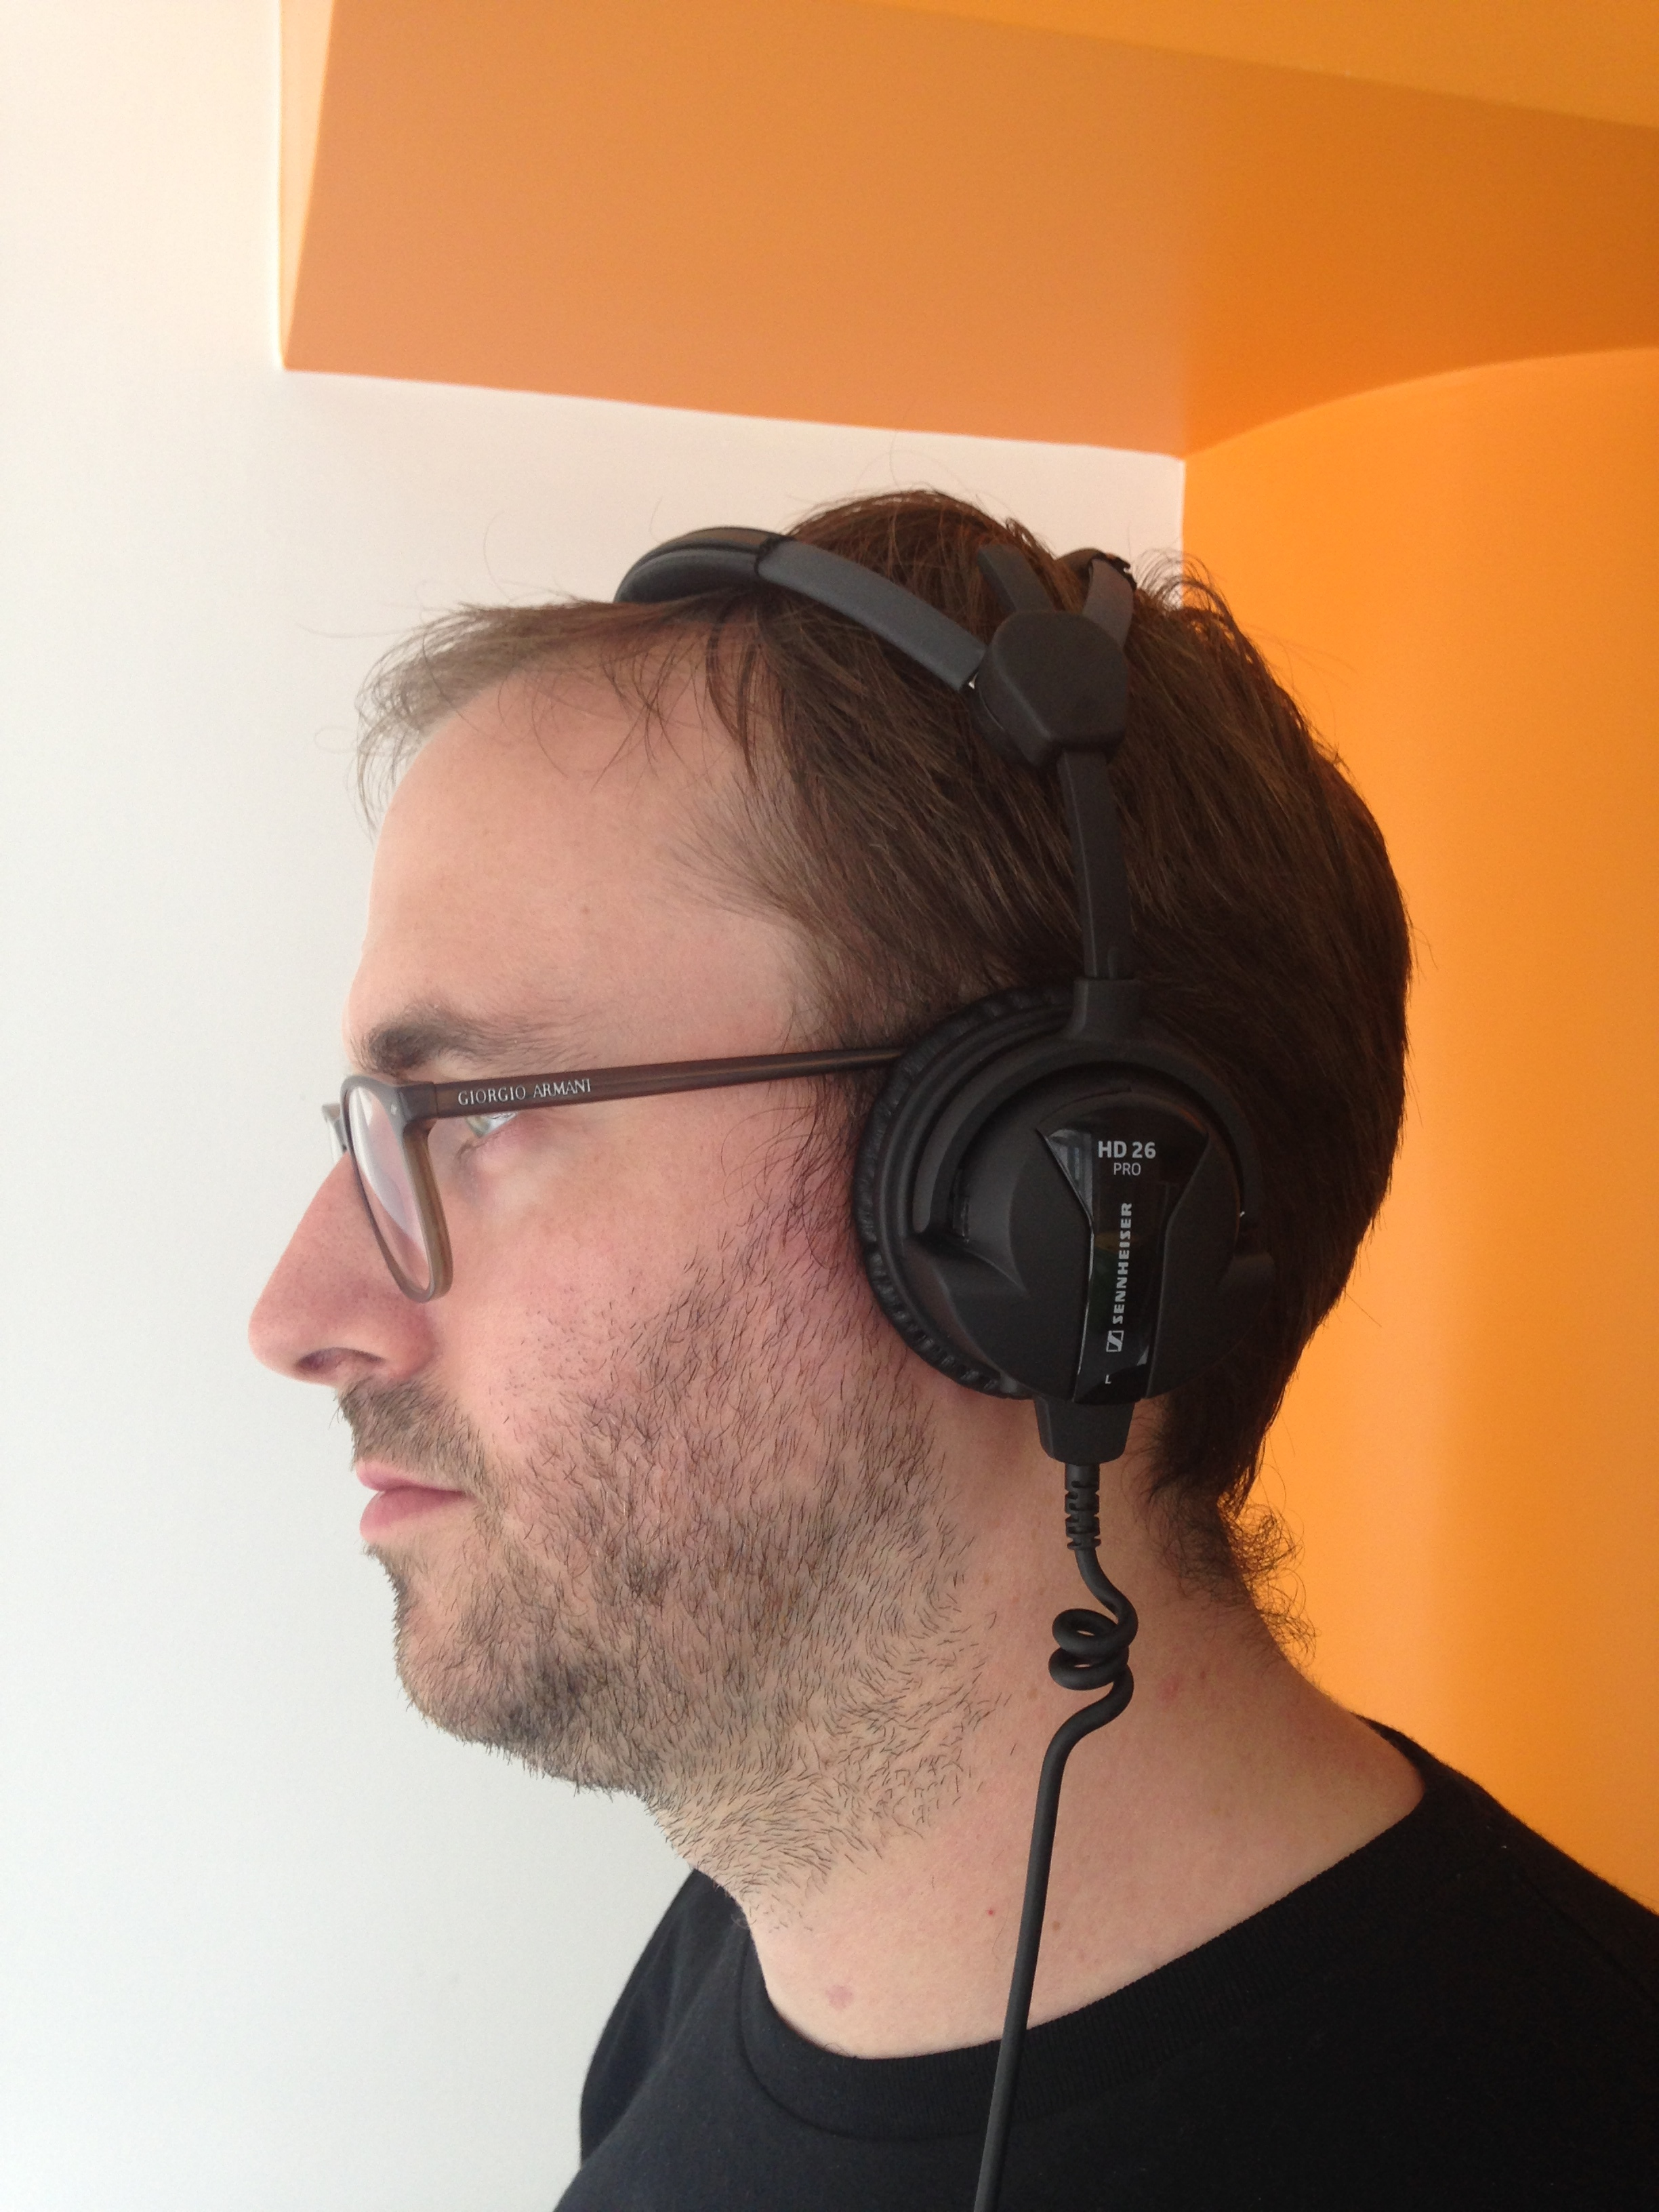 Reviews of TVs, medie streamer & monitors - FlatpanelsHD